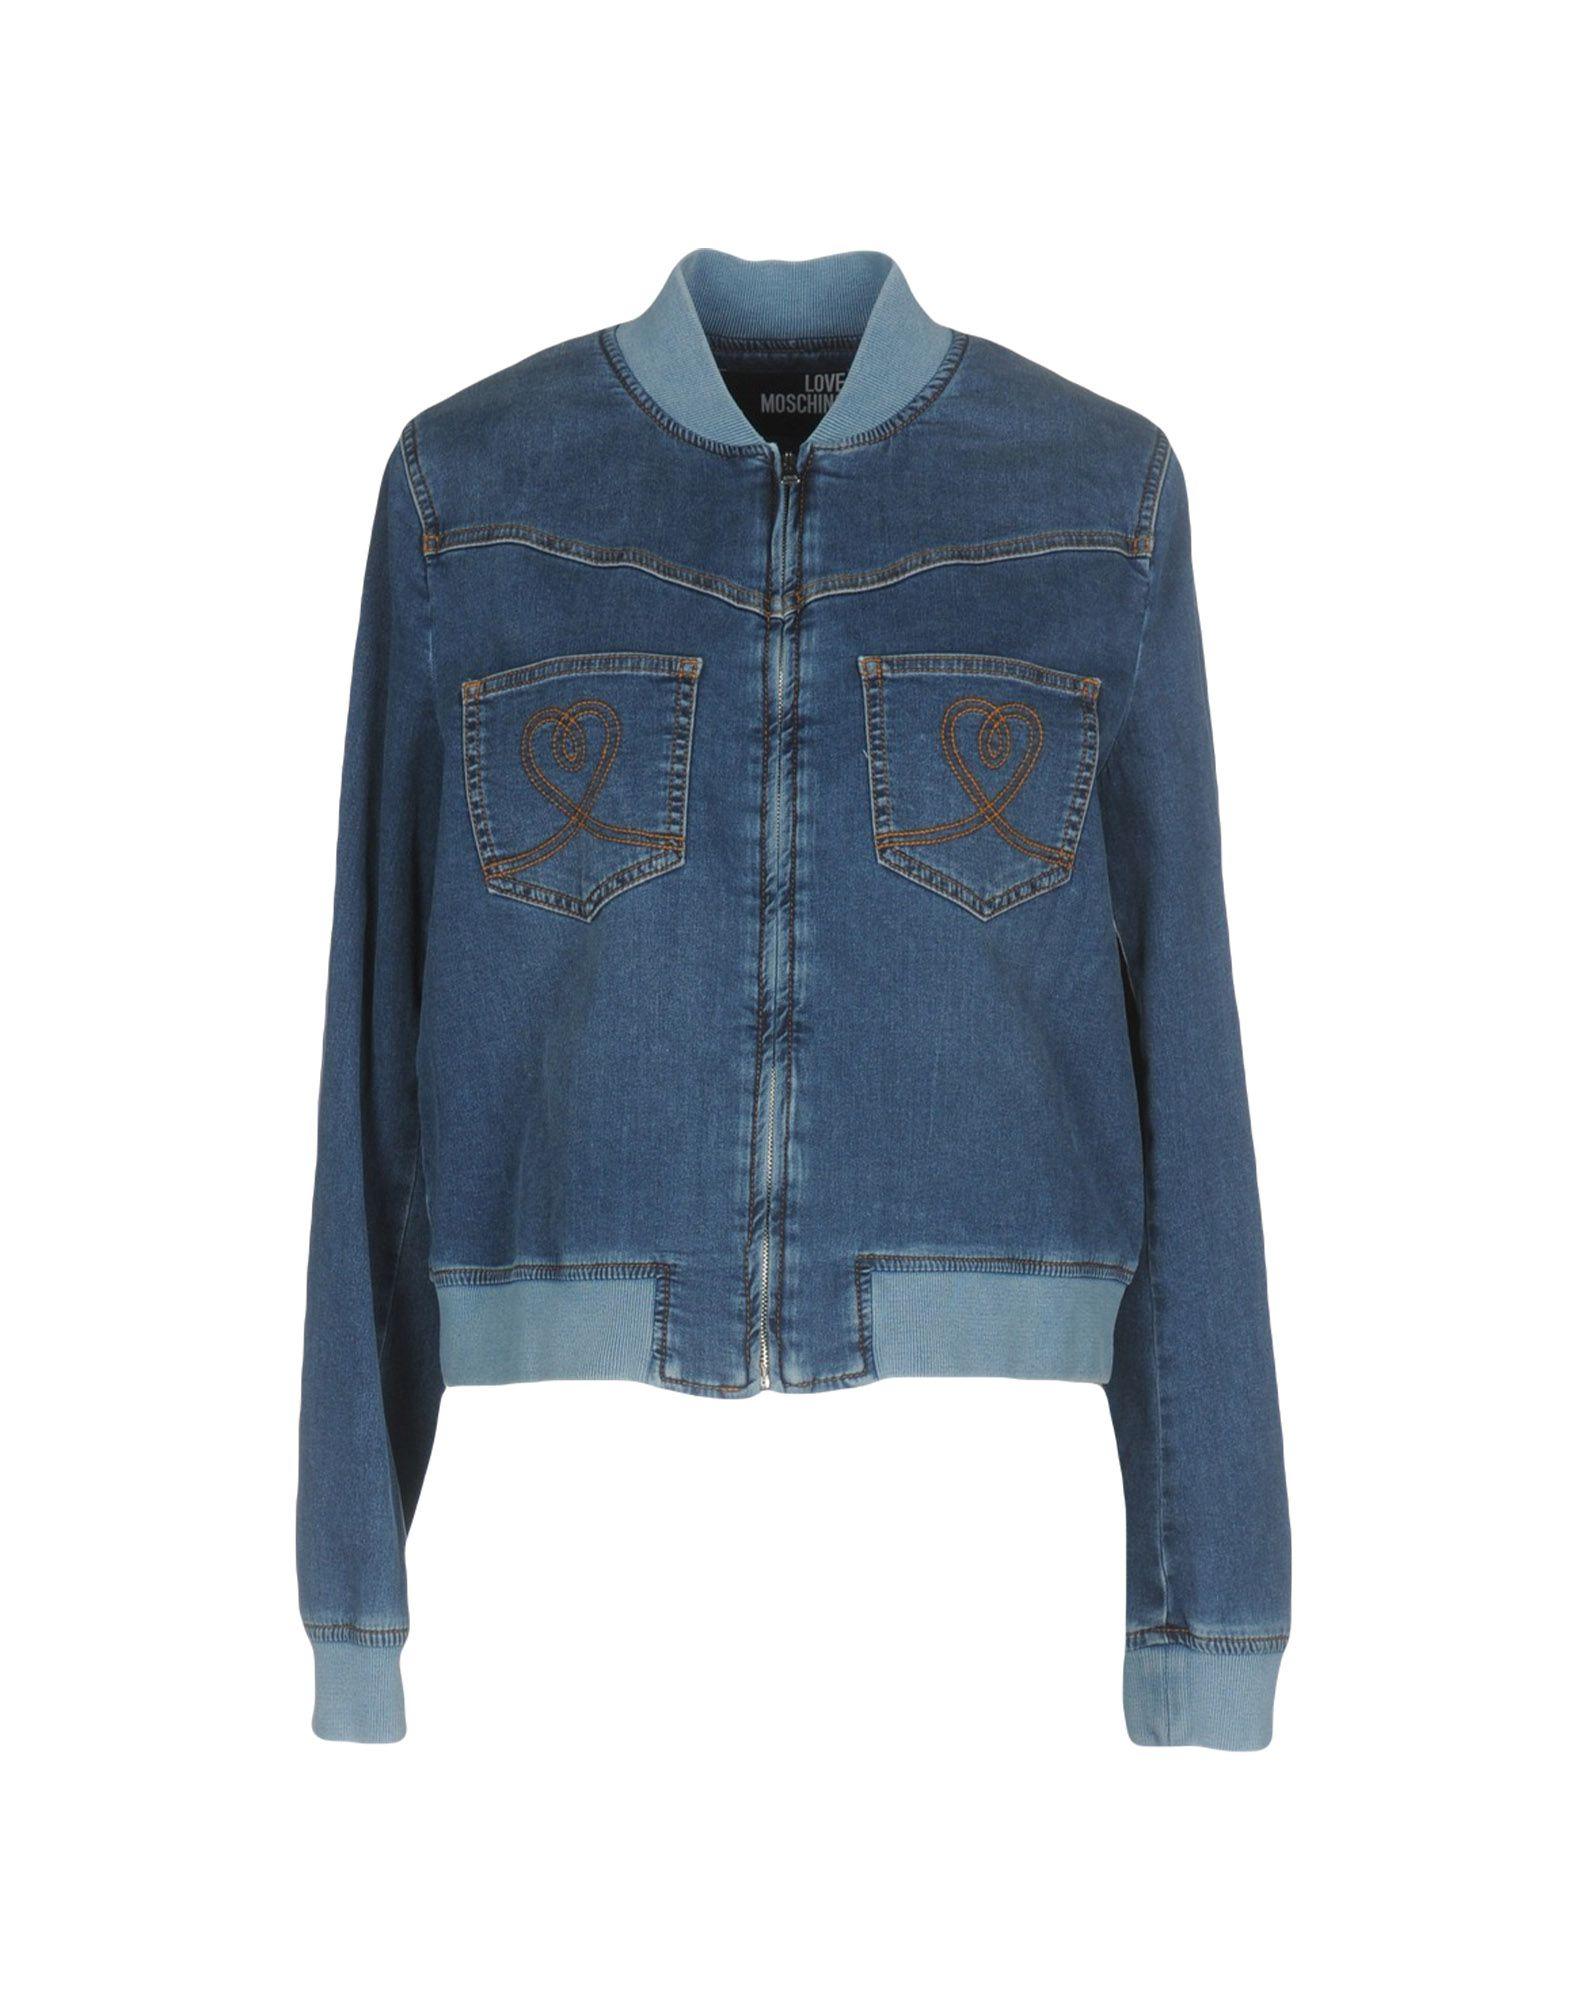 LOVE MOSCHINO Джинсовая верхняя одежда diesel джинсовая верхняя одежда